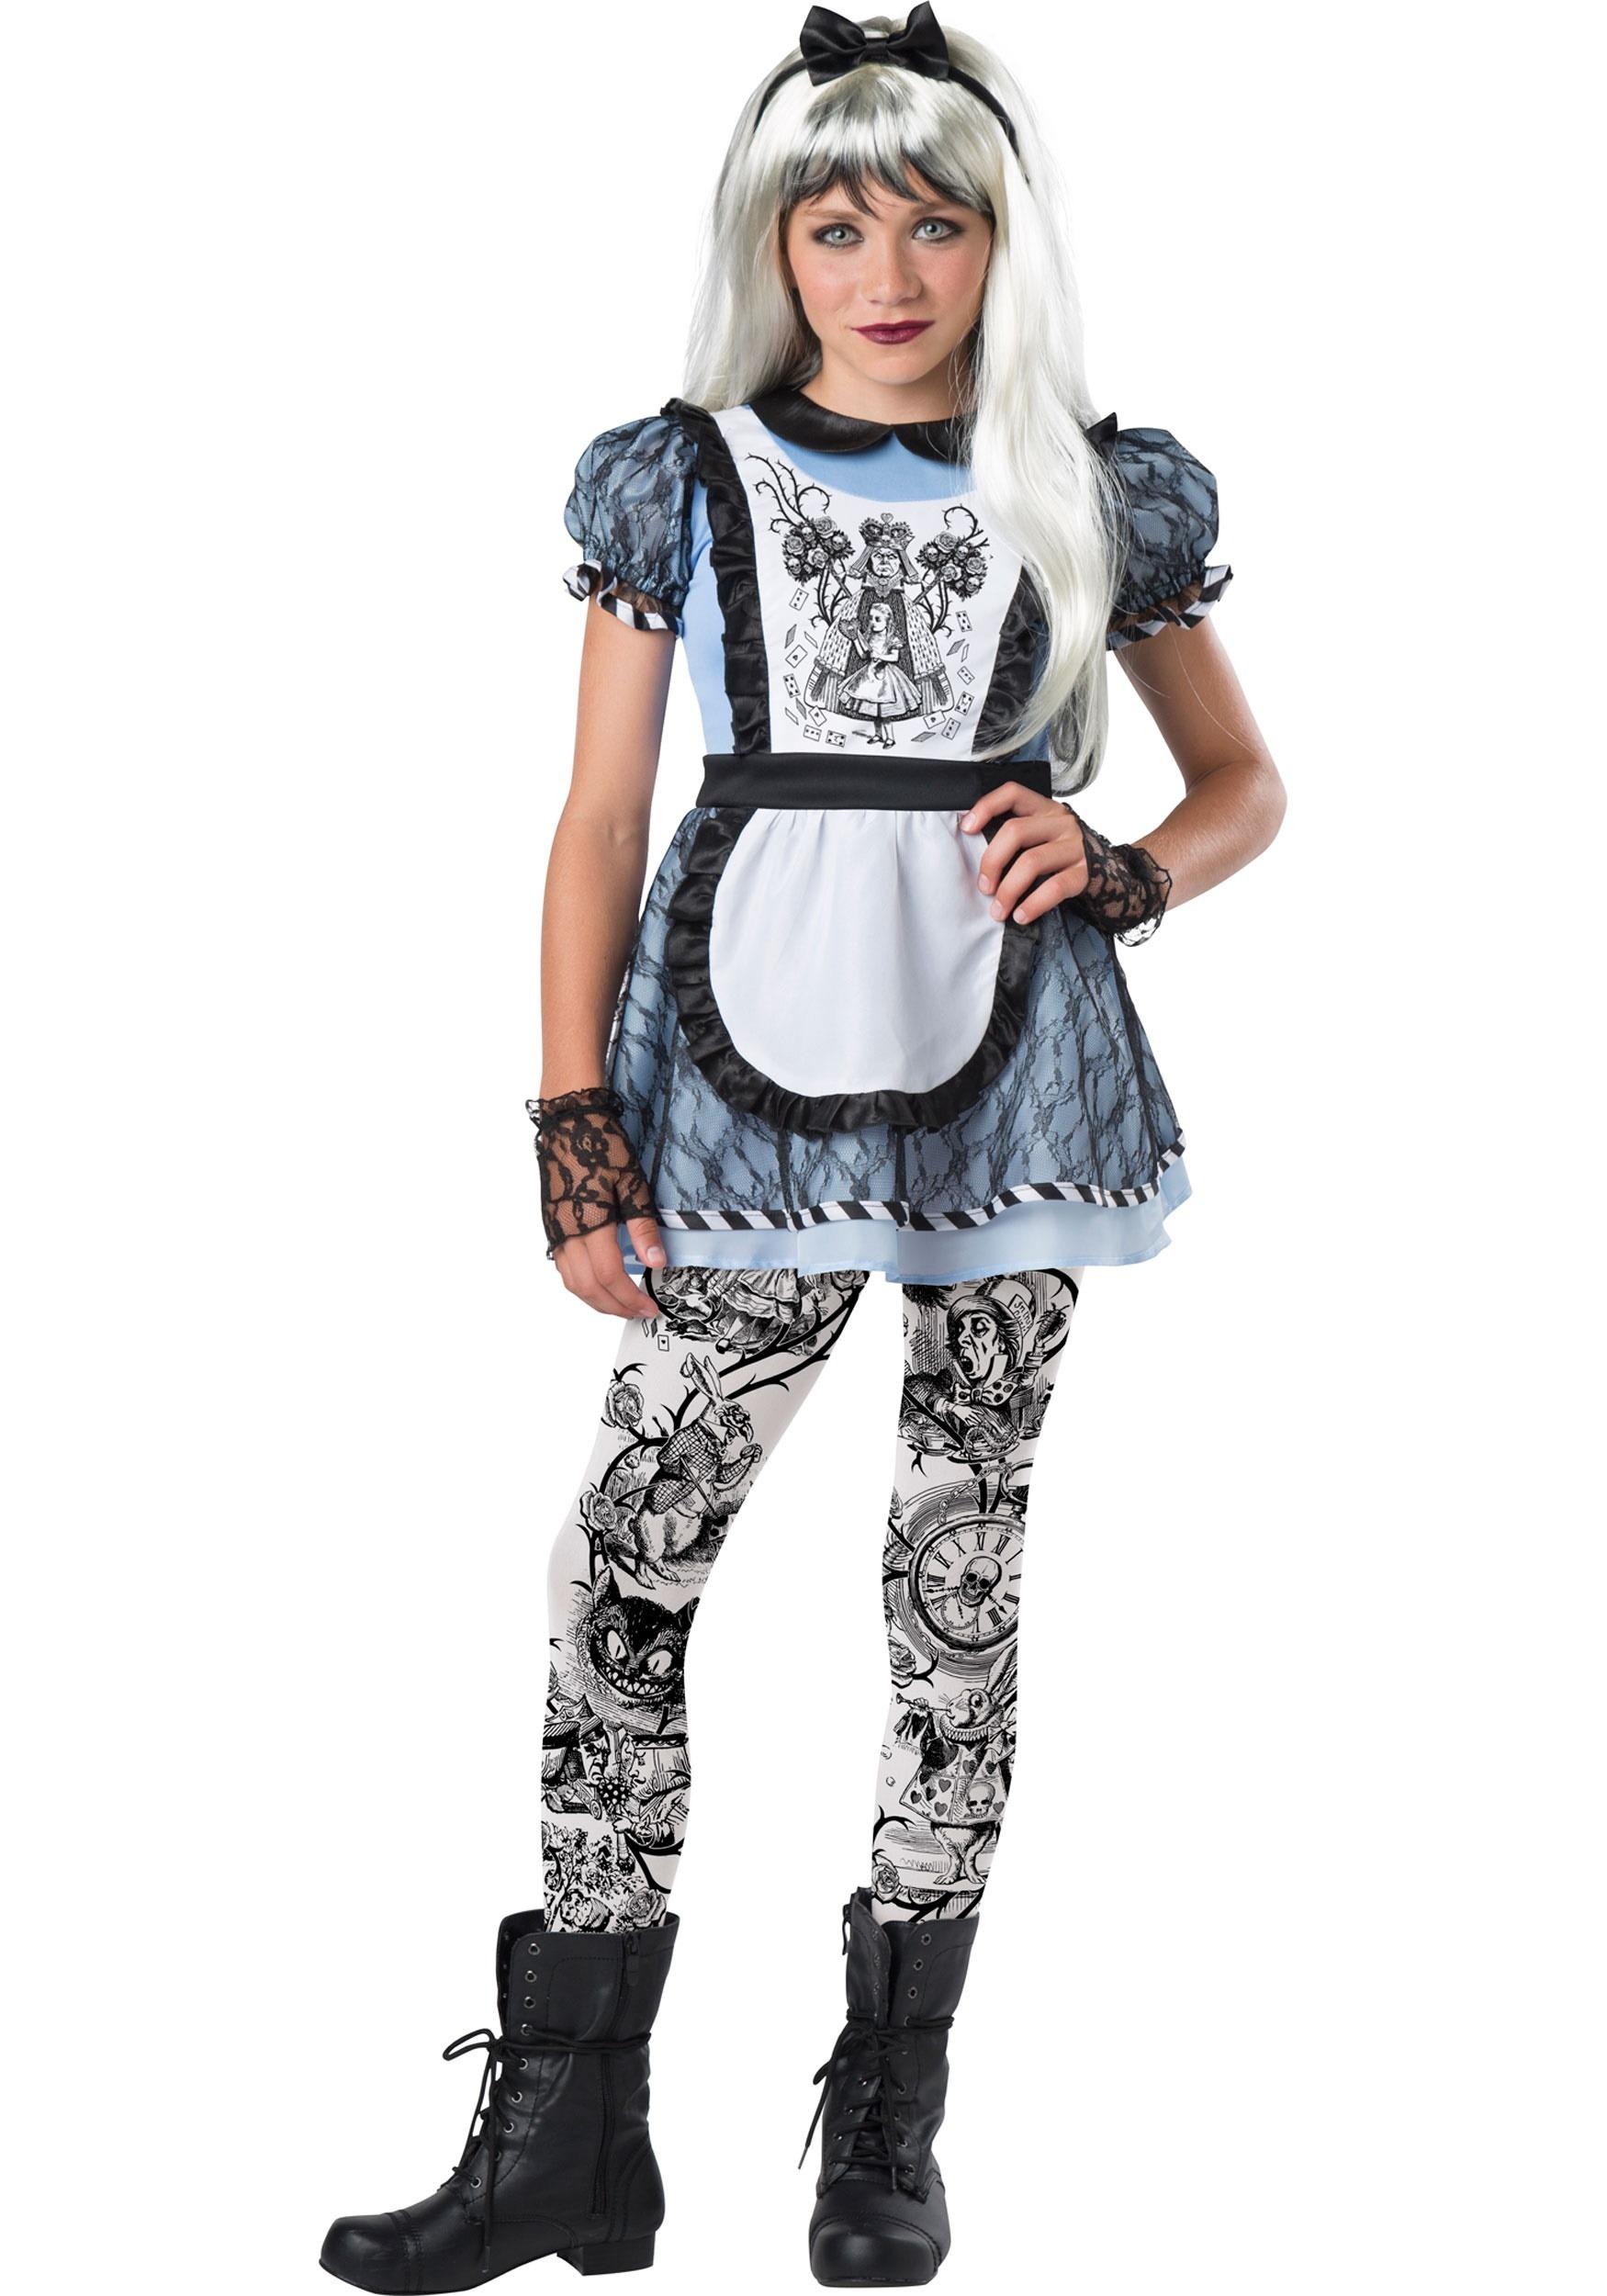 Dark Alice in Wonderland Tween Costume with dress and leggings